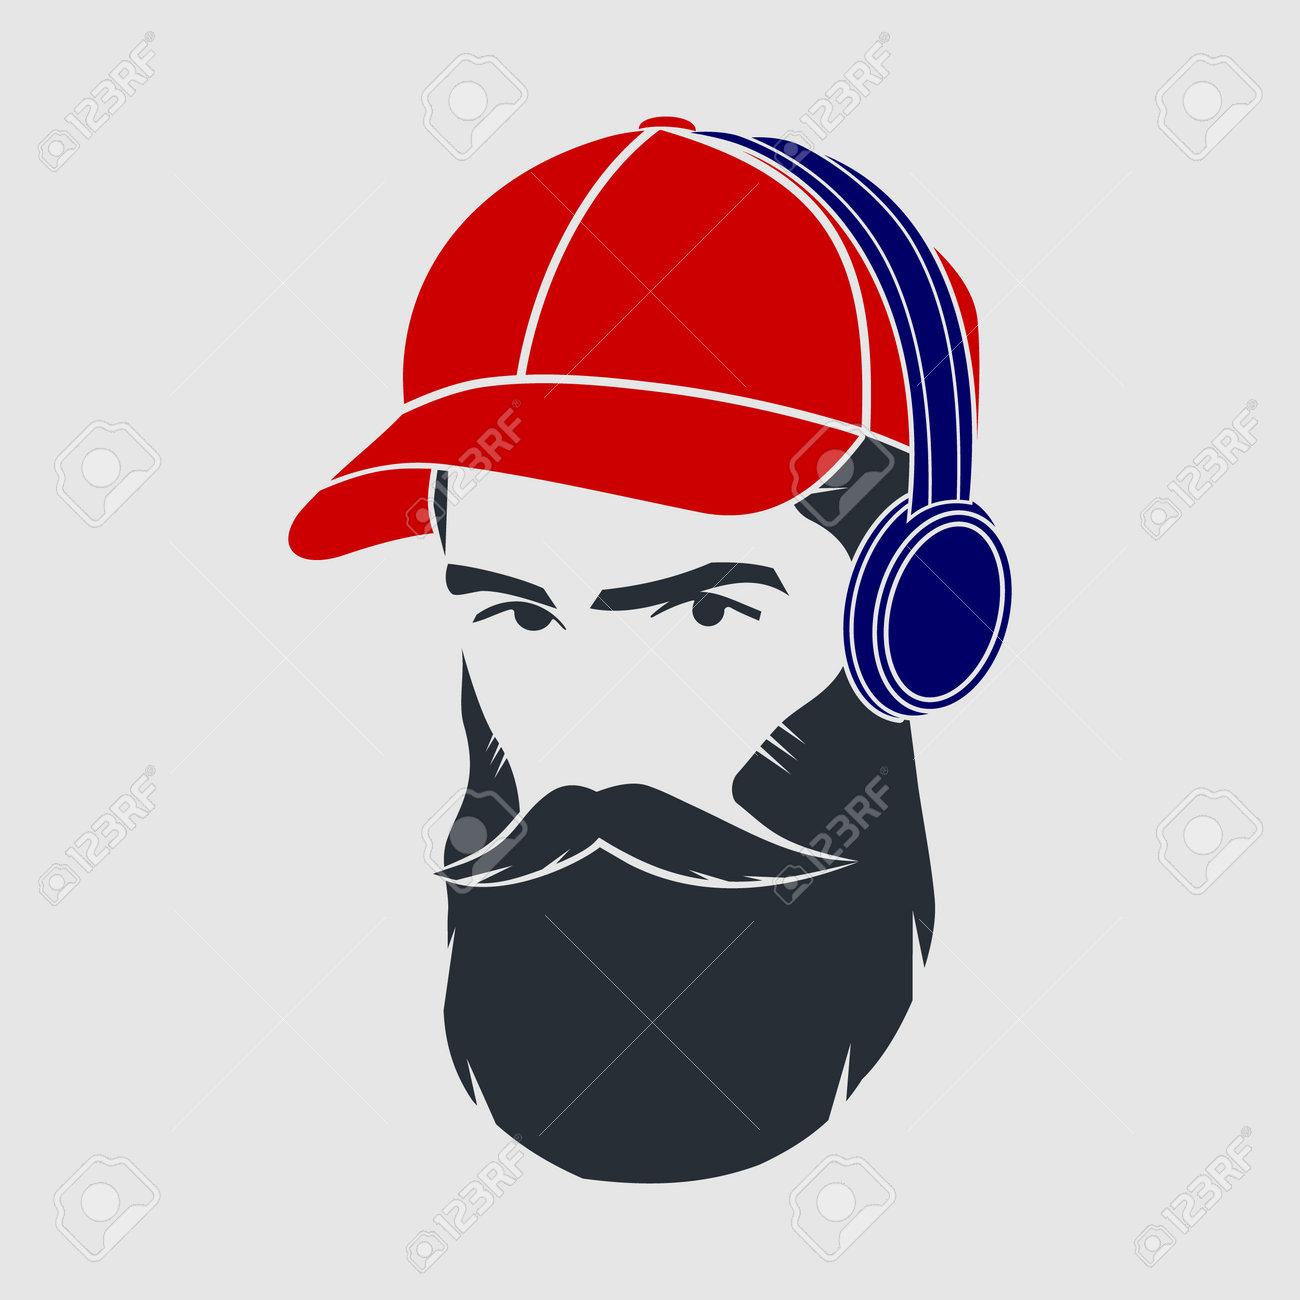 Men in a baseball cap and wireless headphones - 171377994